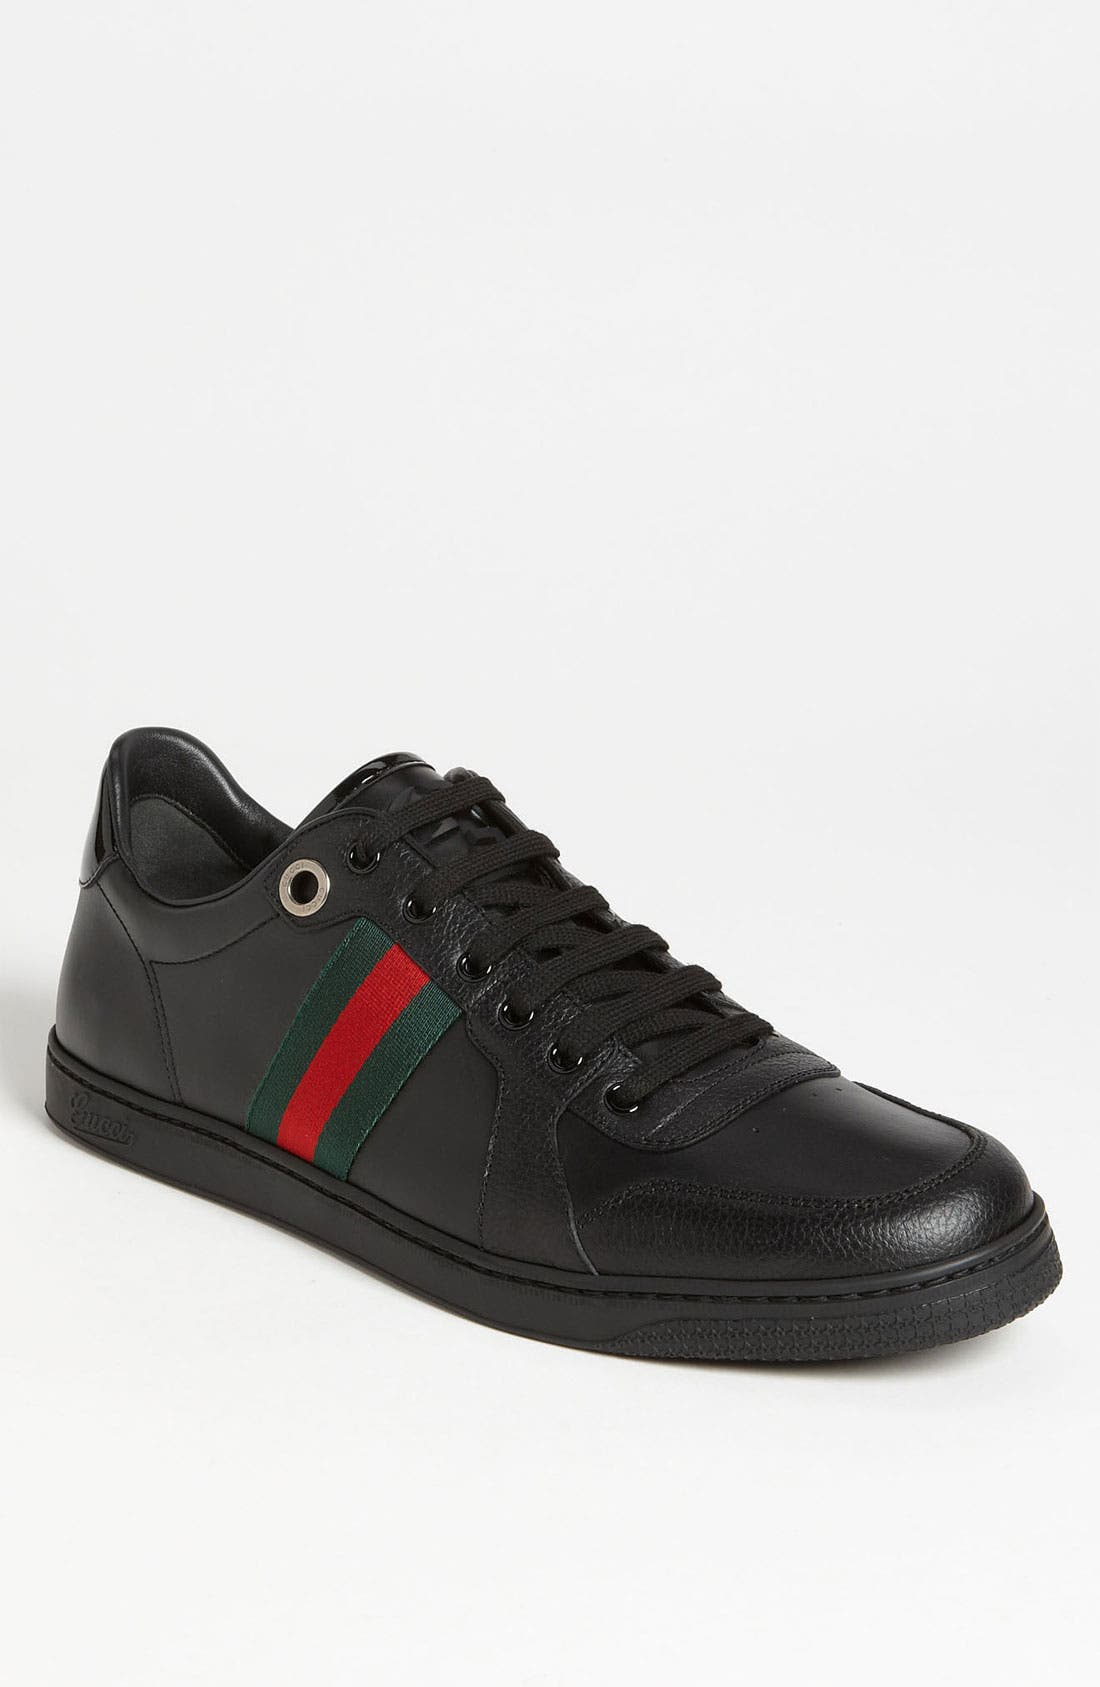 Main Image - Gucci 'Coda Low' Sneaker